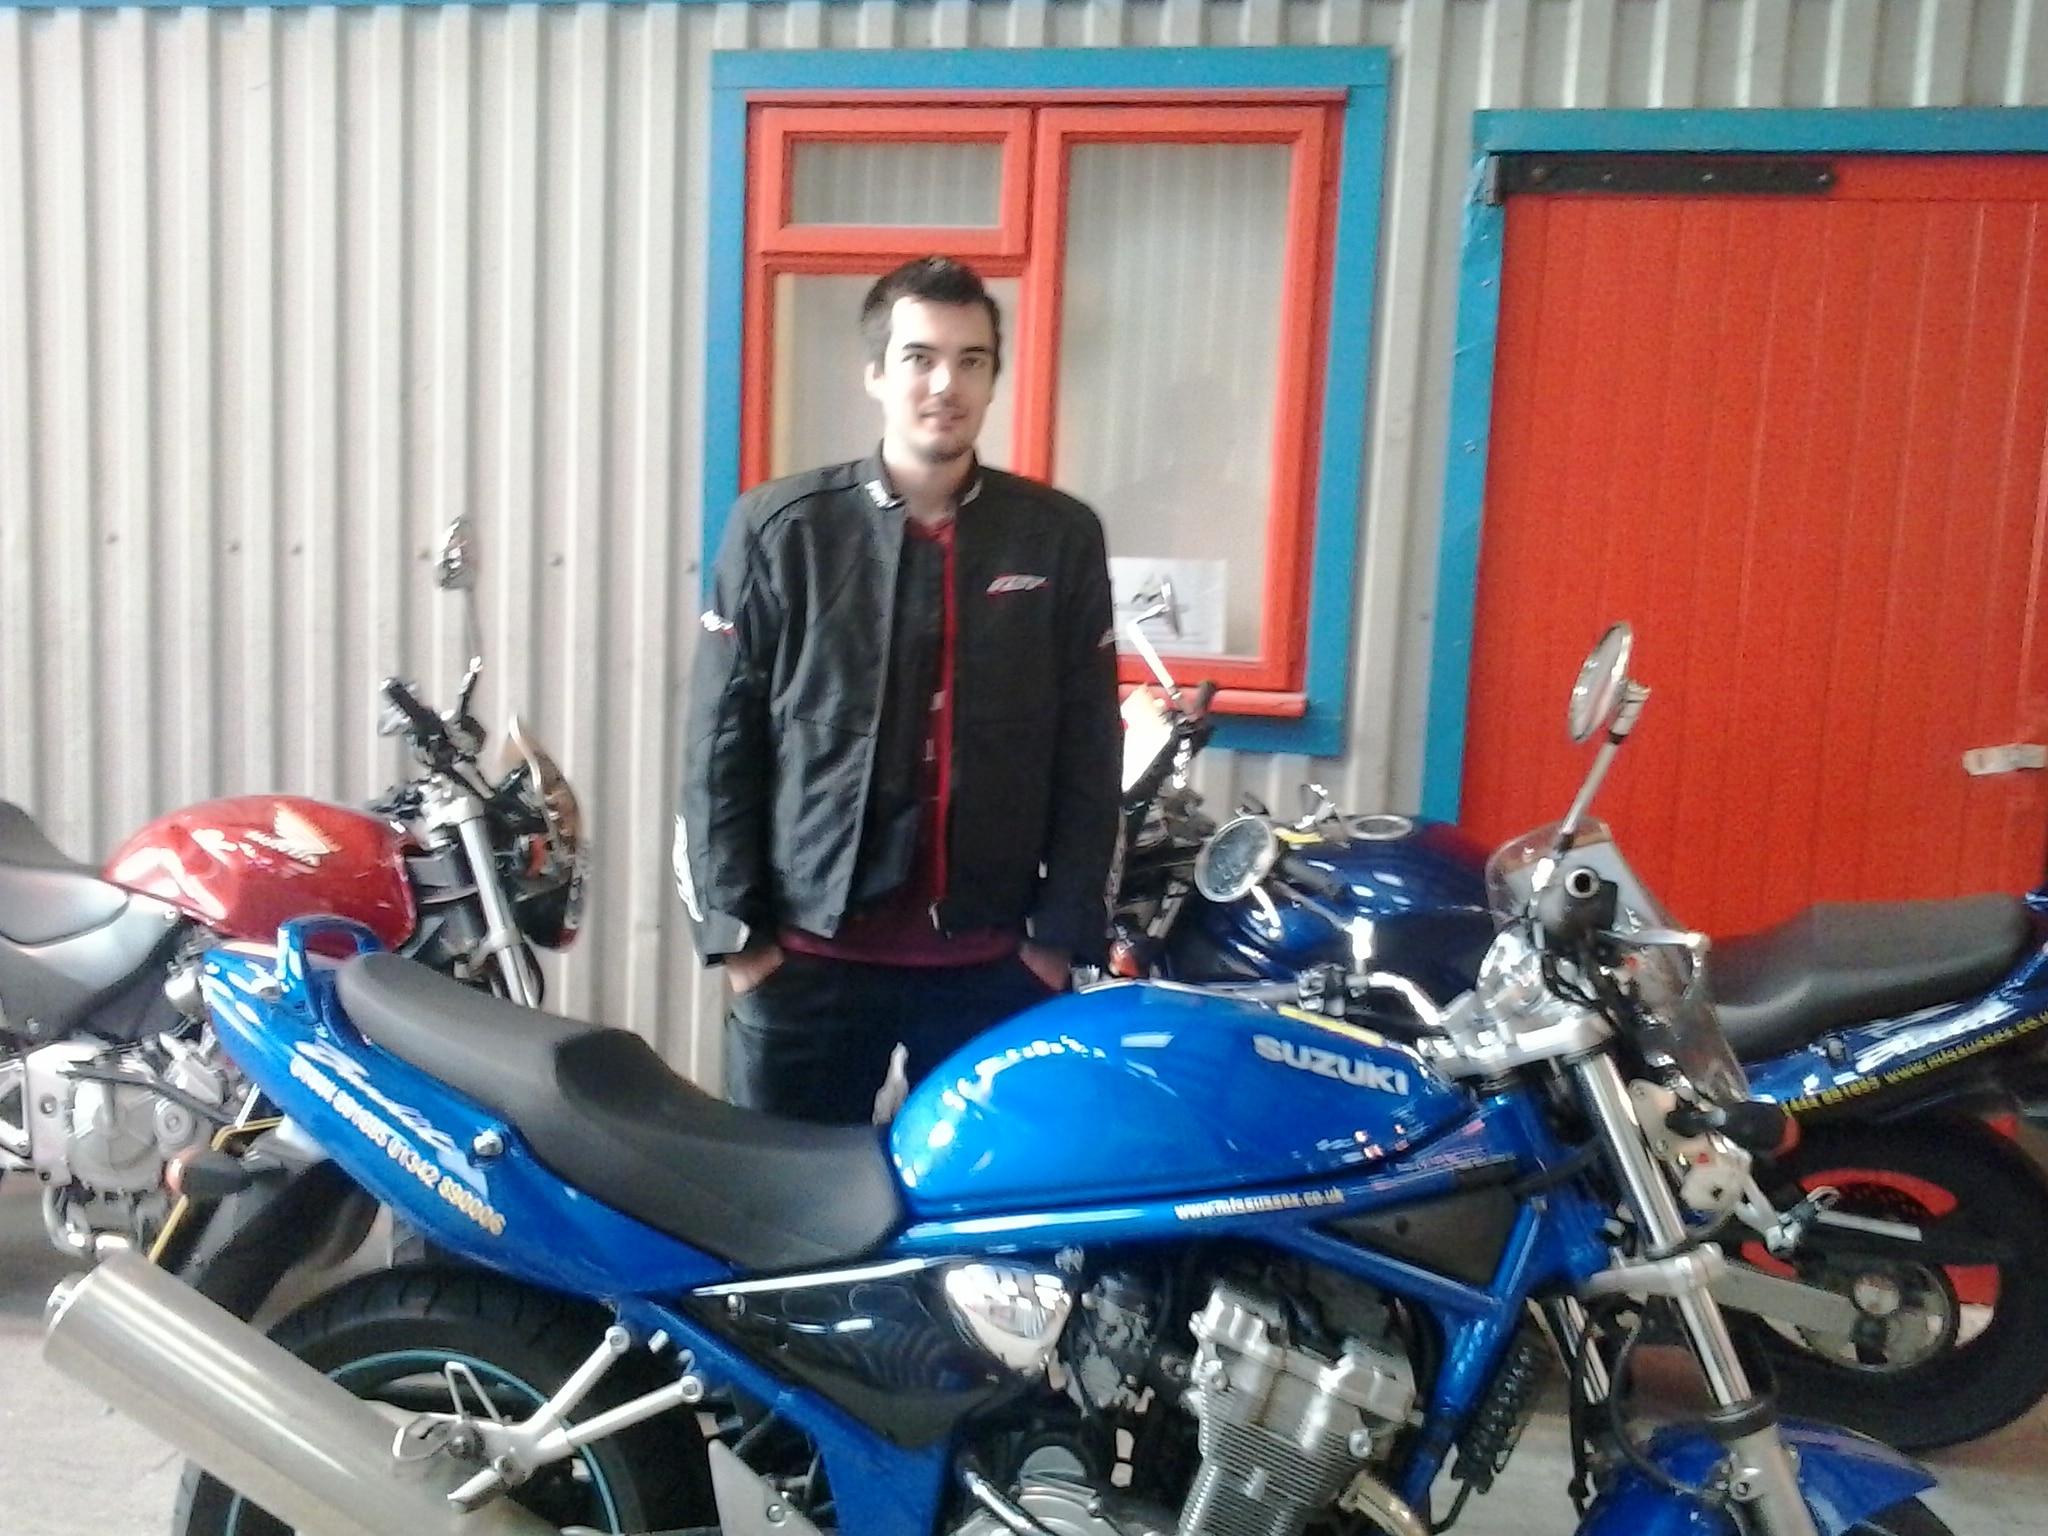 Hassocks has another motorbike rider!